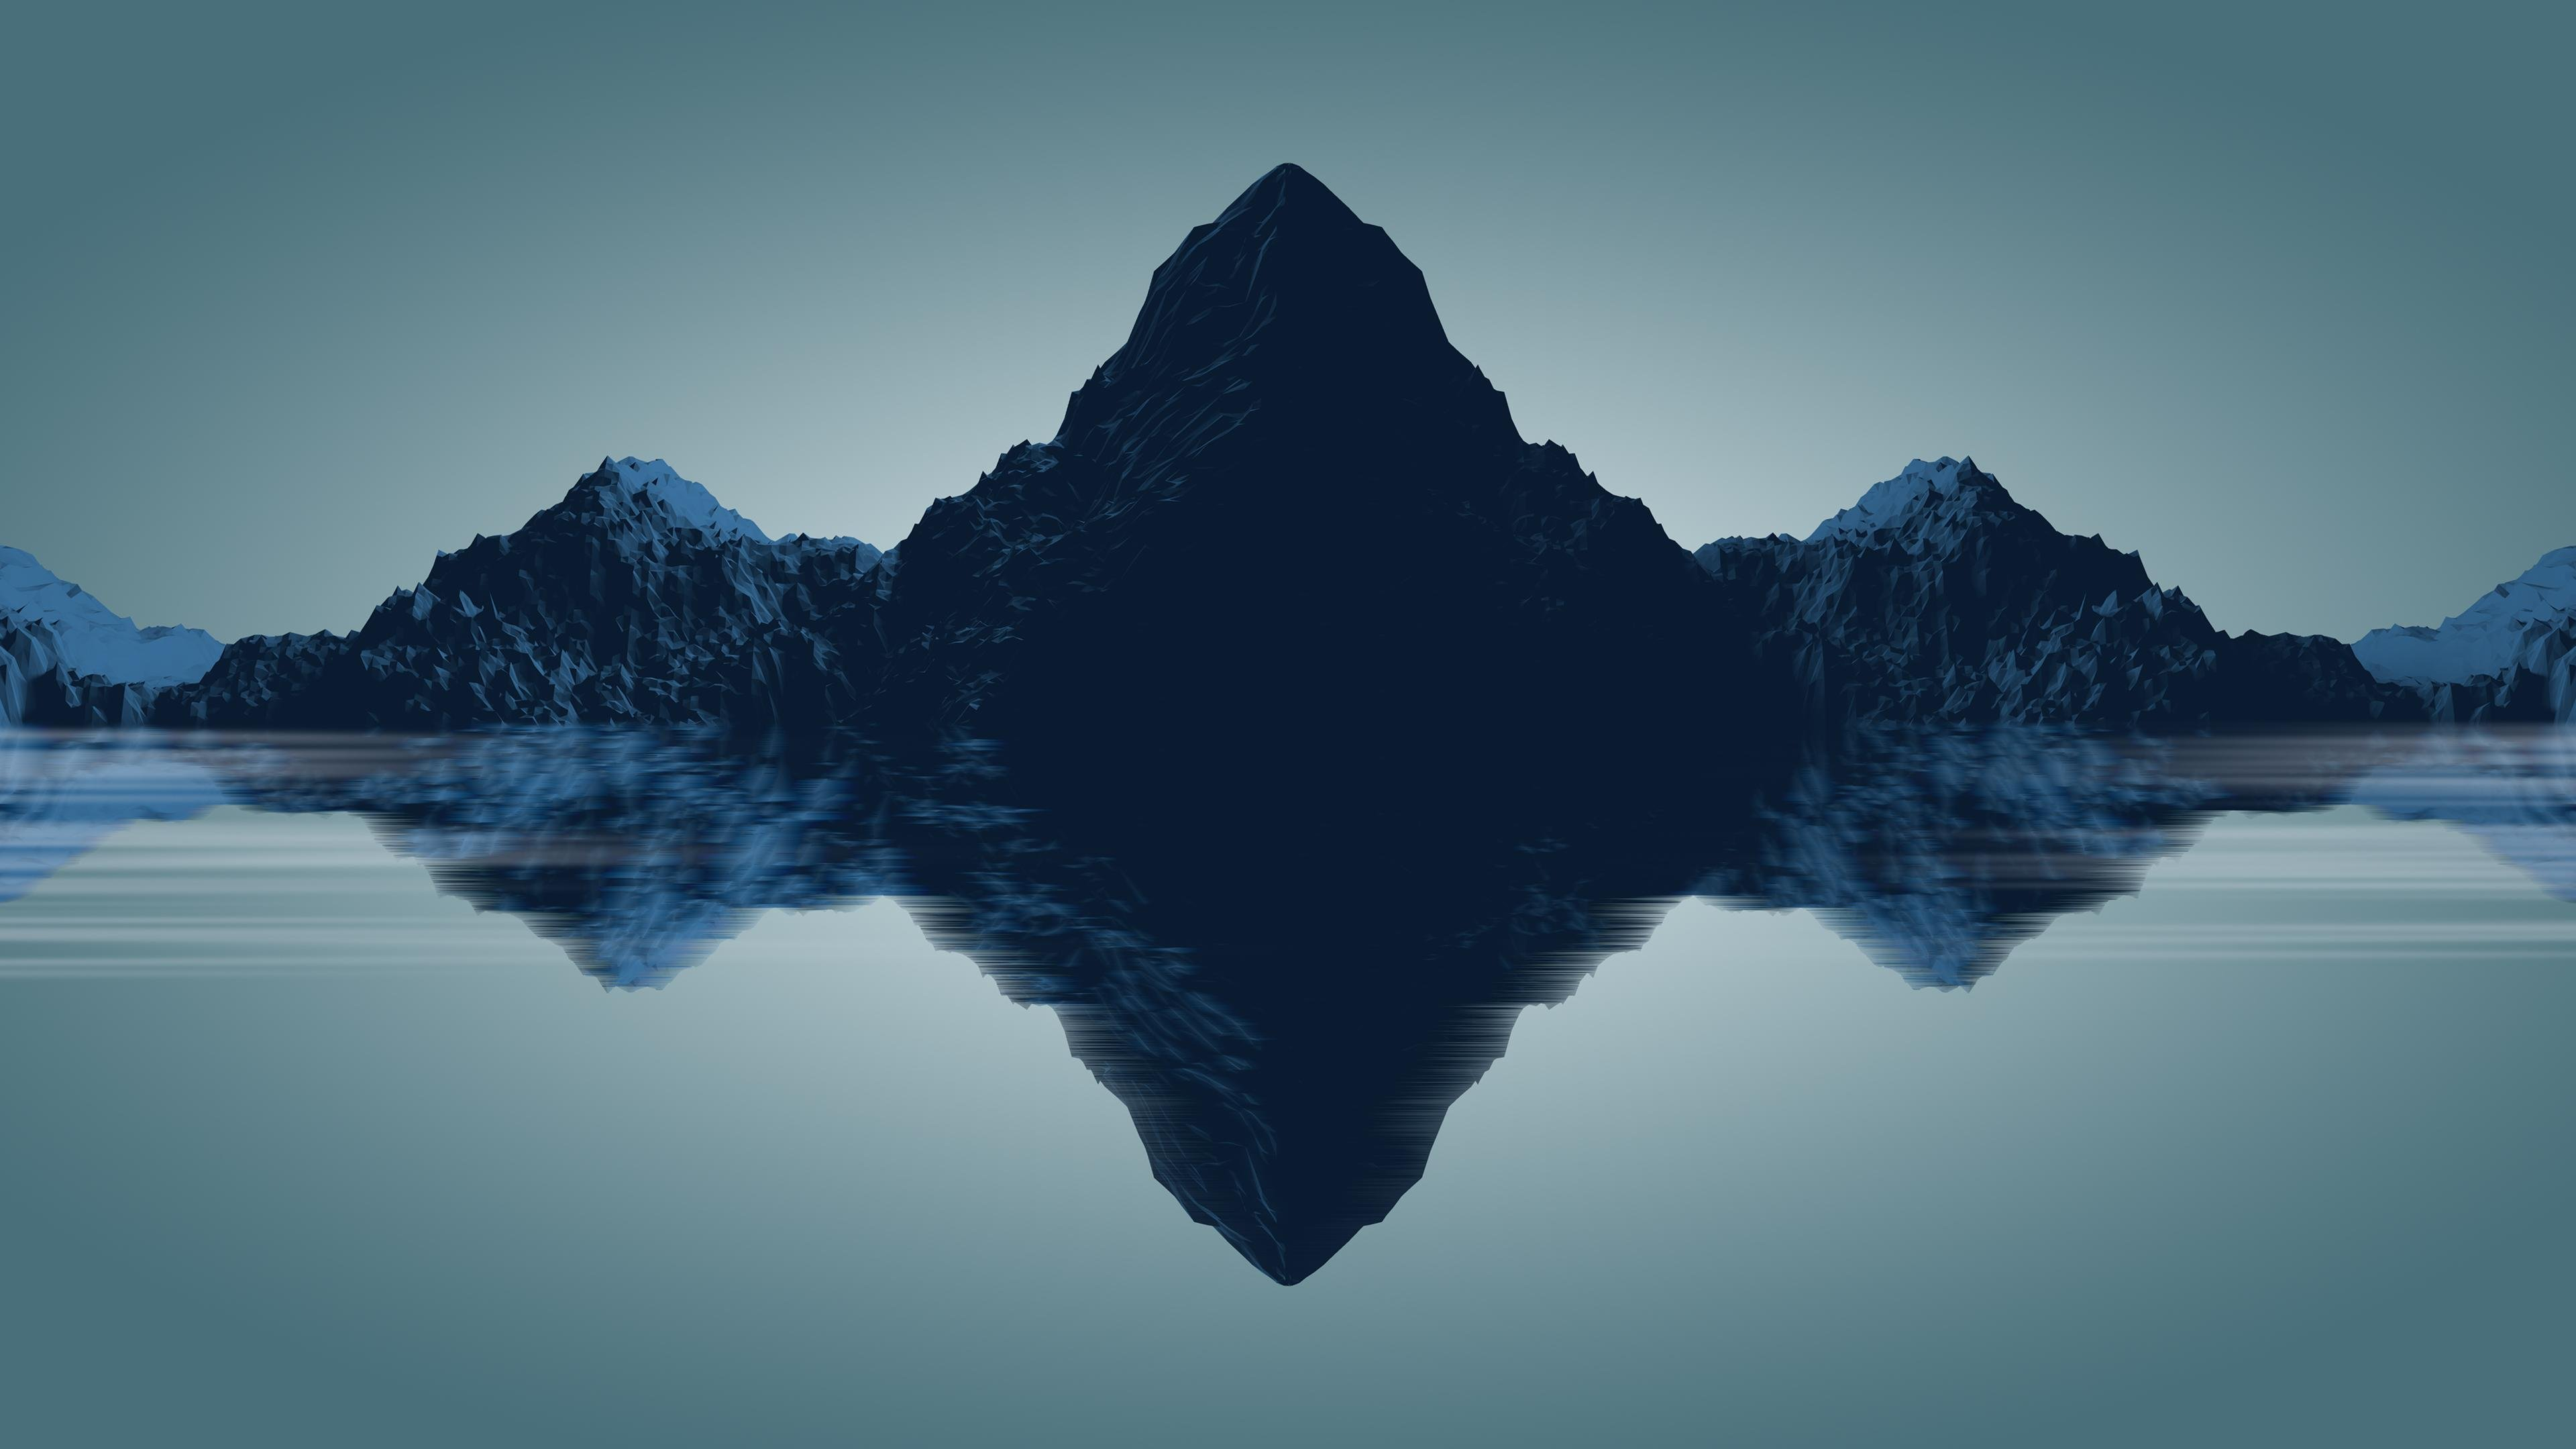 Simple Wallpaper Mountain Minimalistic - minimal-mountains-by-freshpie-wallpaper  Photograph_624334.jpg